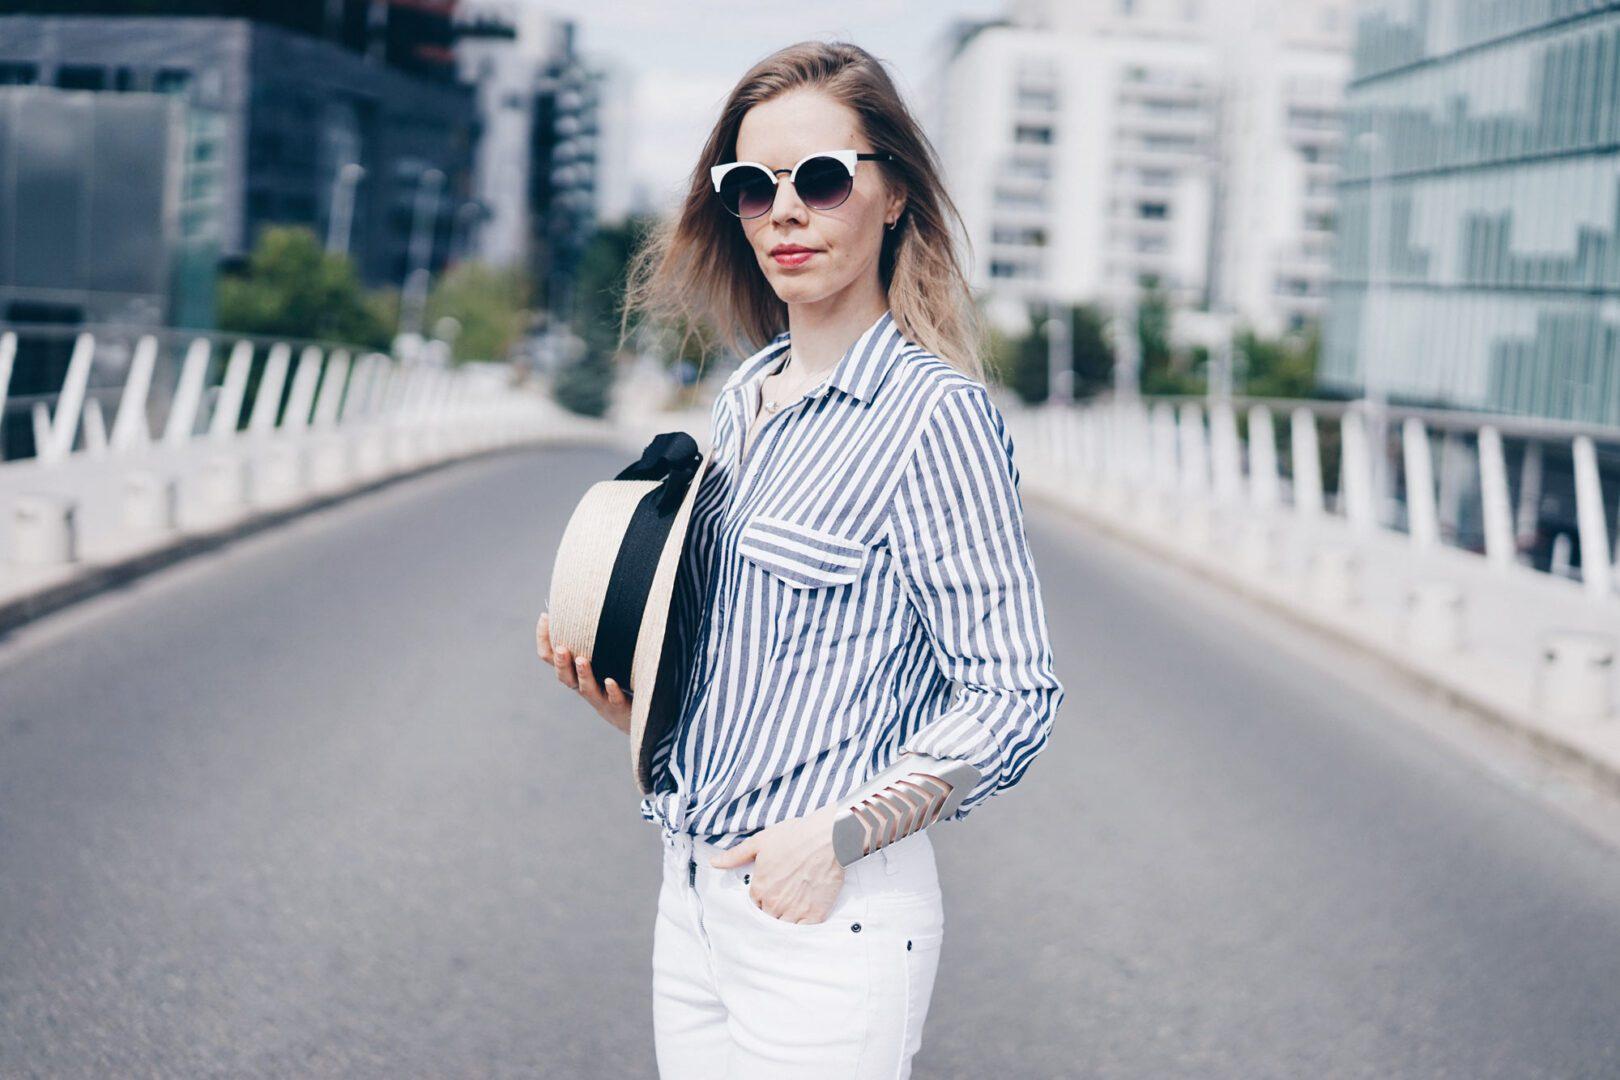 miss-bloggeuse com malines